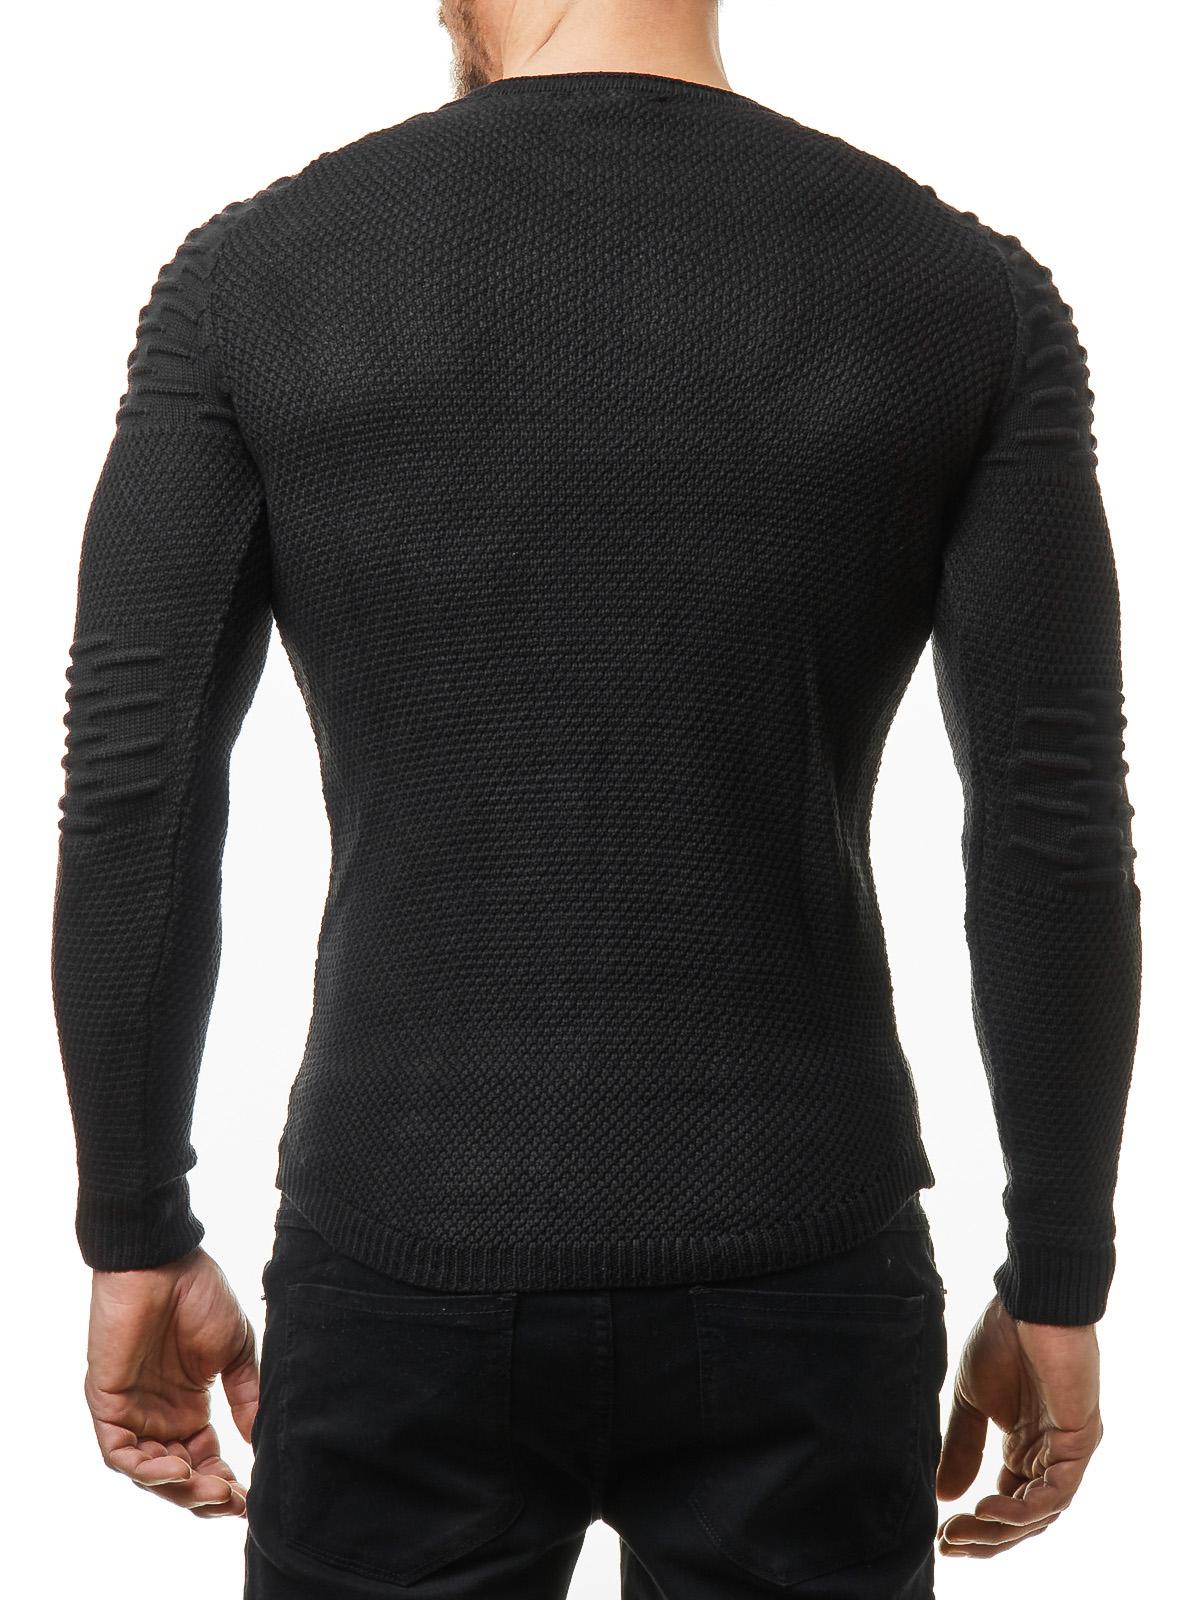 EFS1810 Strickpullover Clothing Pullover Strickpullover   EightyFive 55df8d35ad